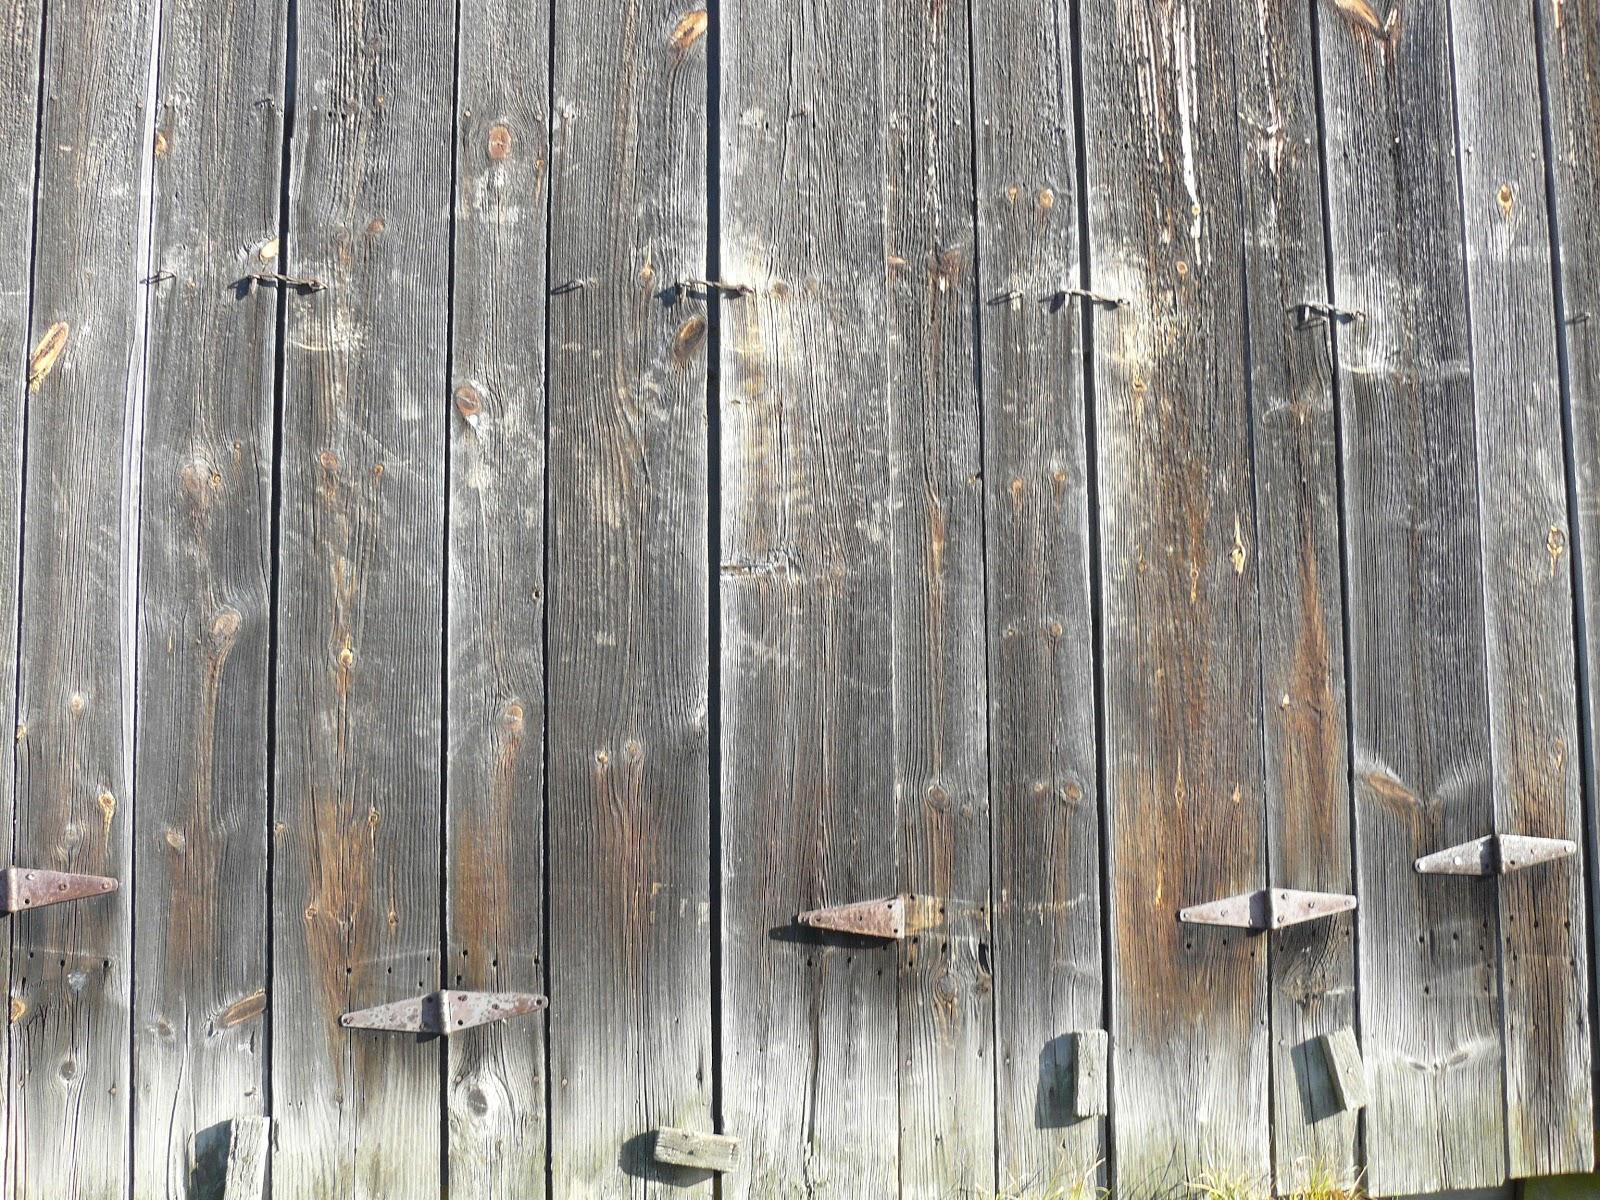 Barn Wood Wallpaper Old Wood Background Wallpaper